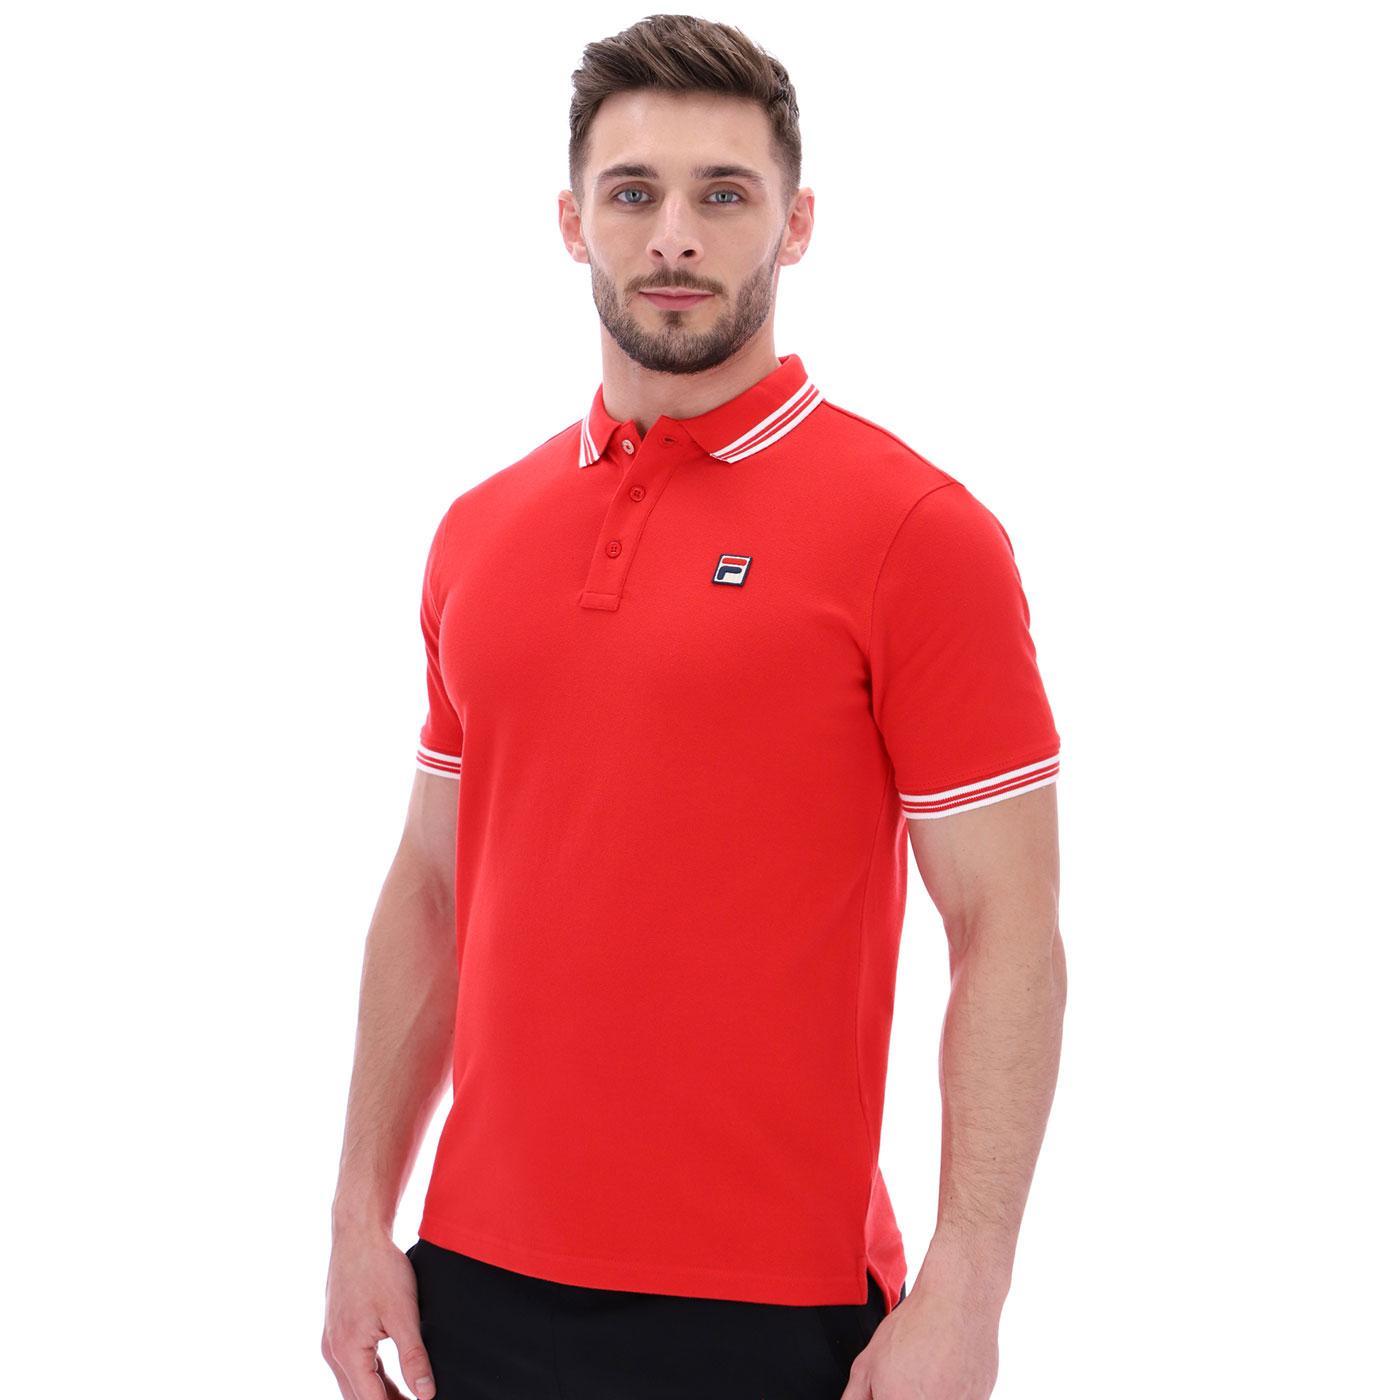 FILA VINTAGE Prime Retro Tipped Polo (England Red)